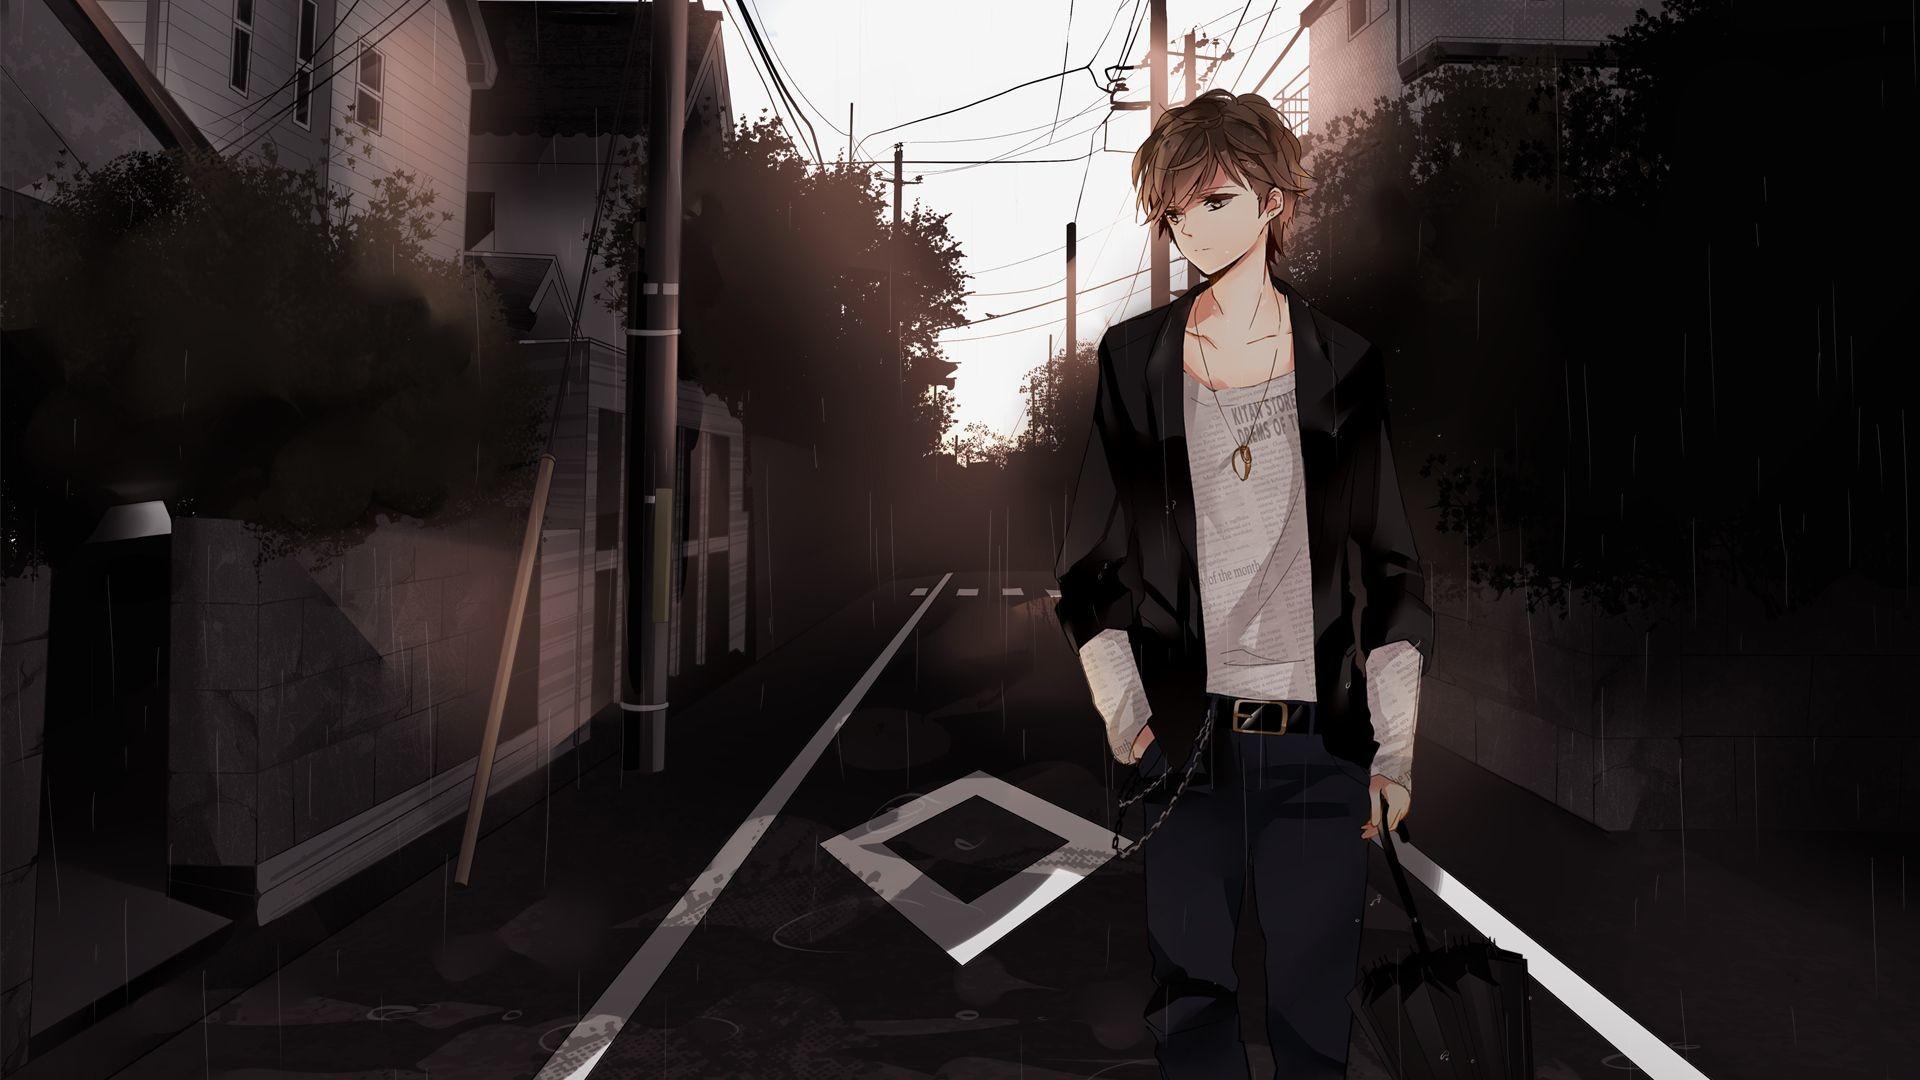 Sad Anime Wallpapers 78 Images